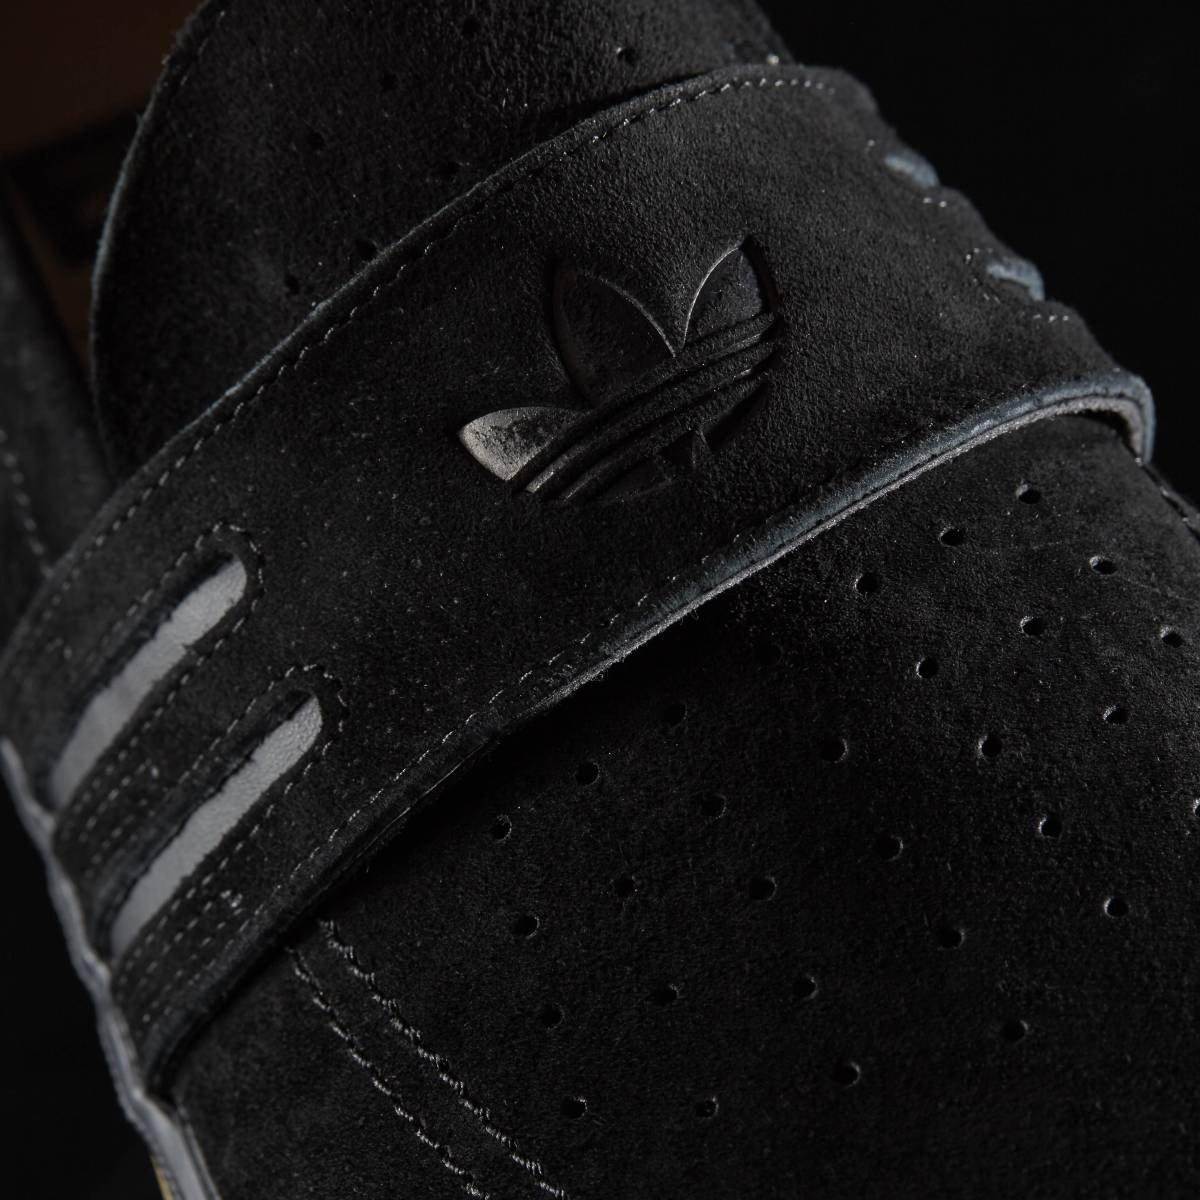 premium selection e28dd fdb75 adidas Acapulco Skateboarding Penny Loafer Shoes Black BB8428 Mens UK 10,  EU 44.23 Amazon.co.uk Shoes  Bags